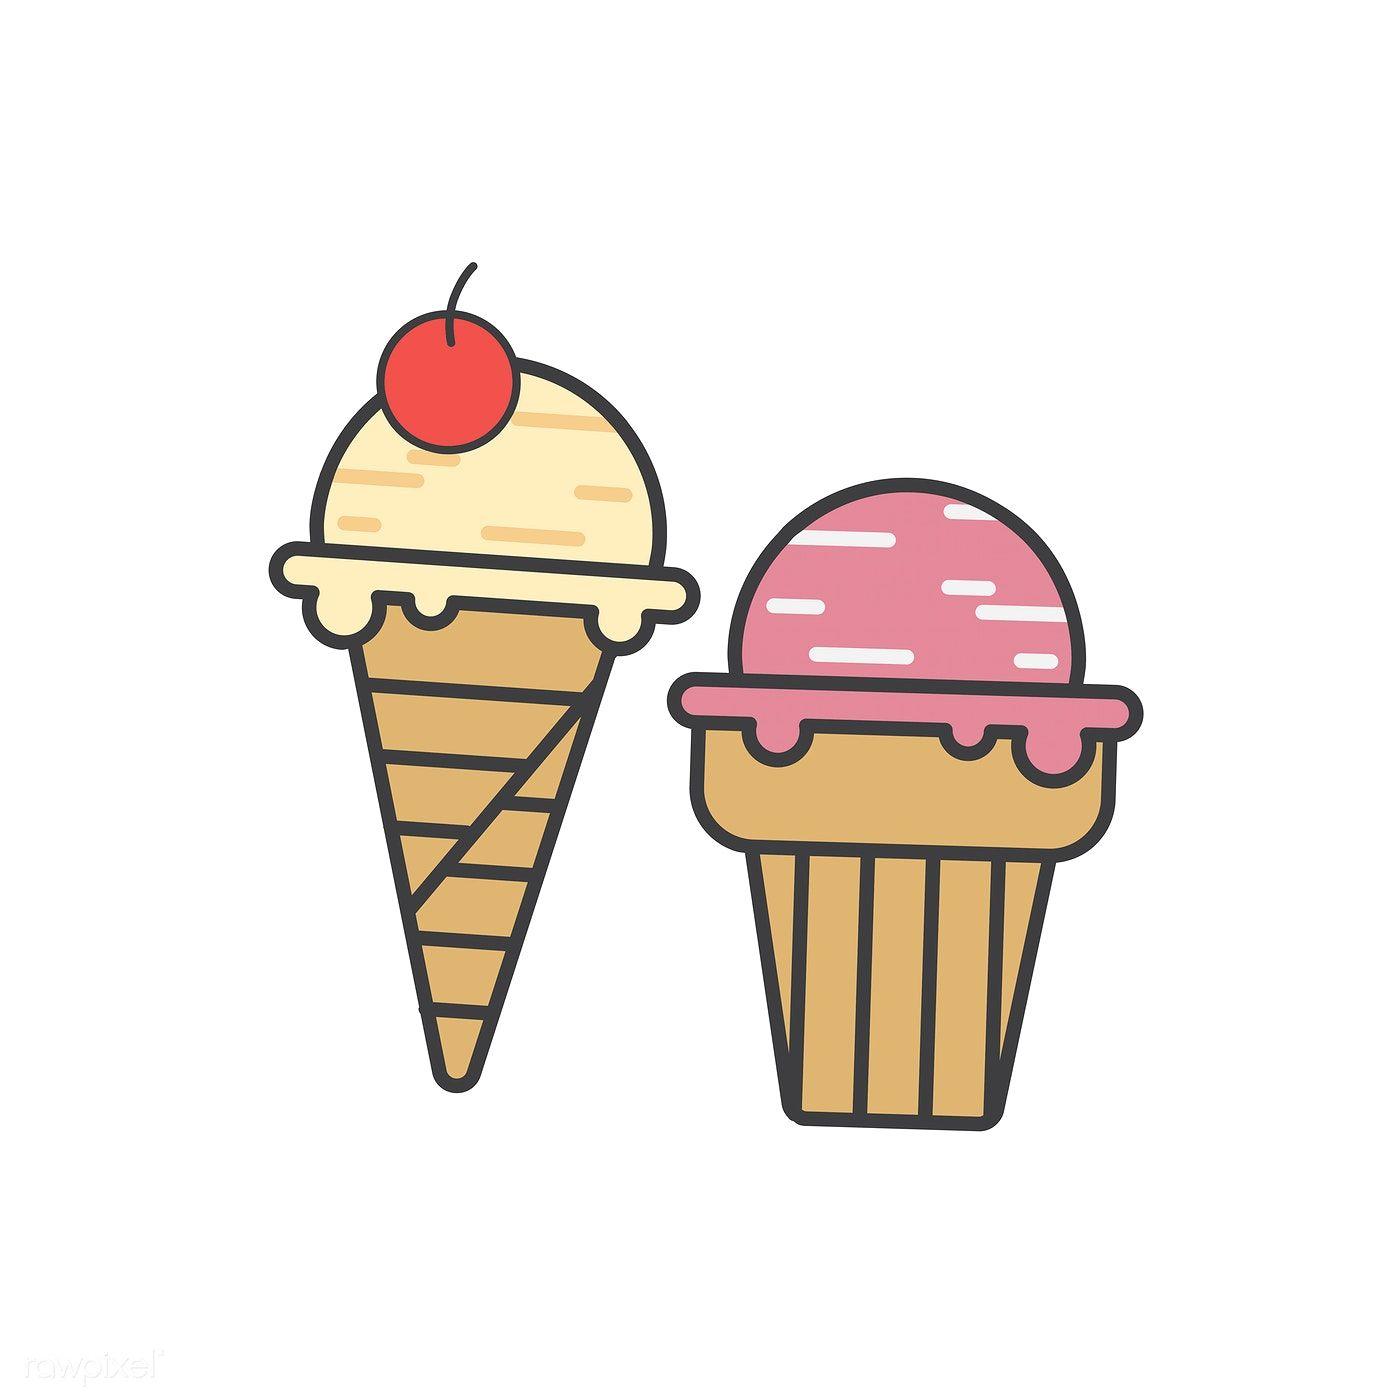 illustration of ice cream icon free image by rawpixel com illustration vector free icon illustration of ice cream icon free